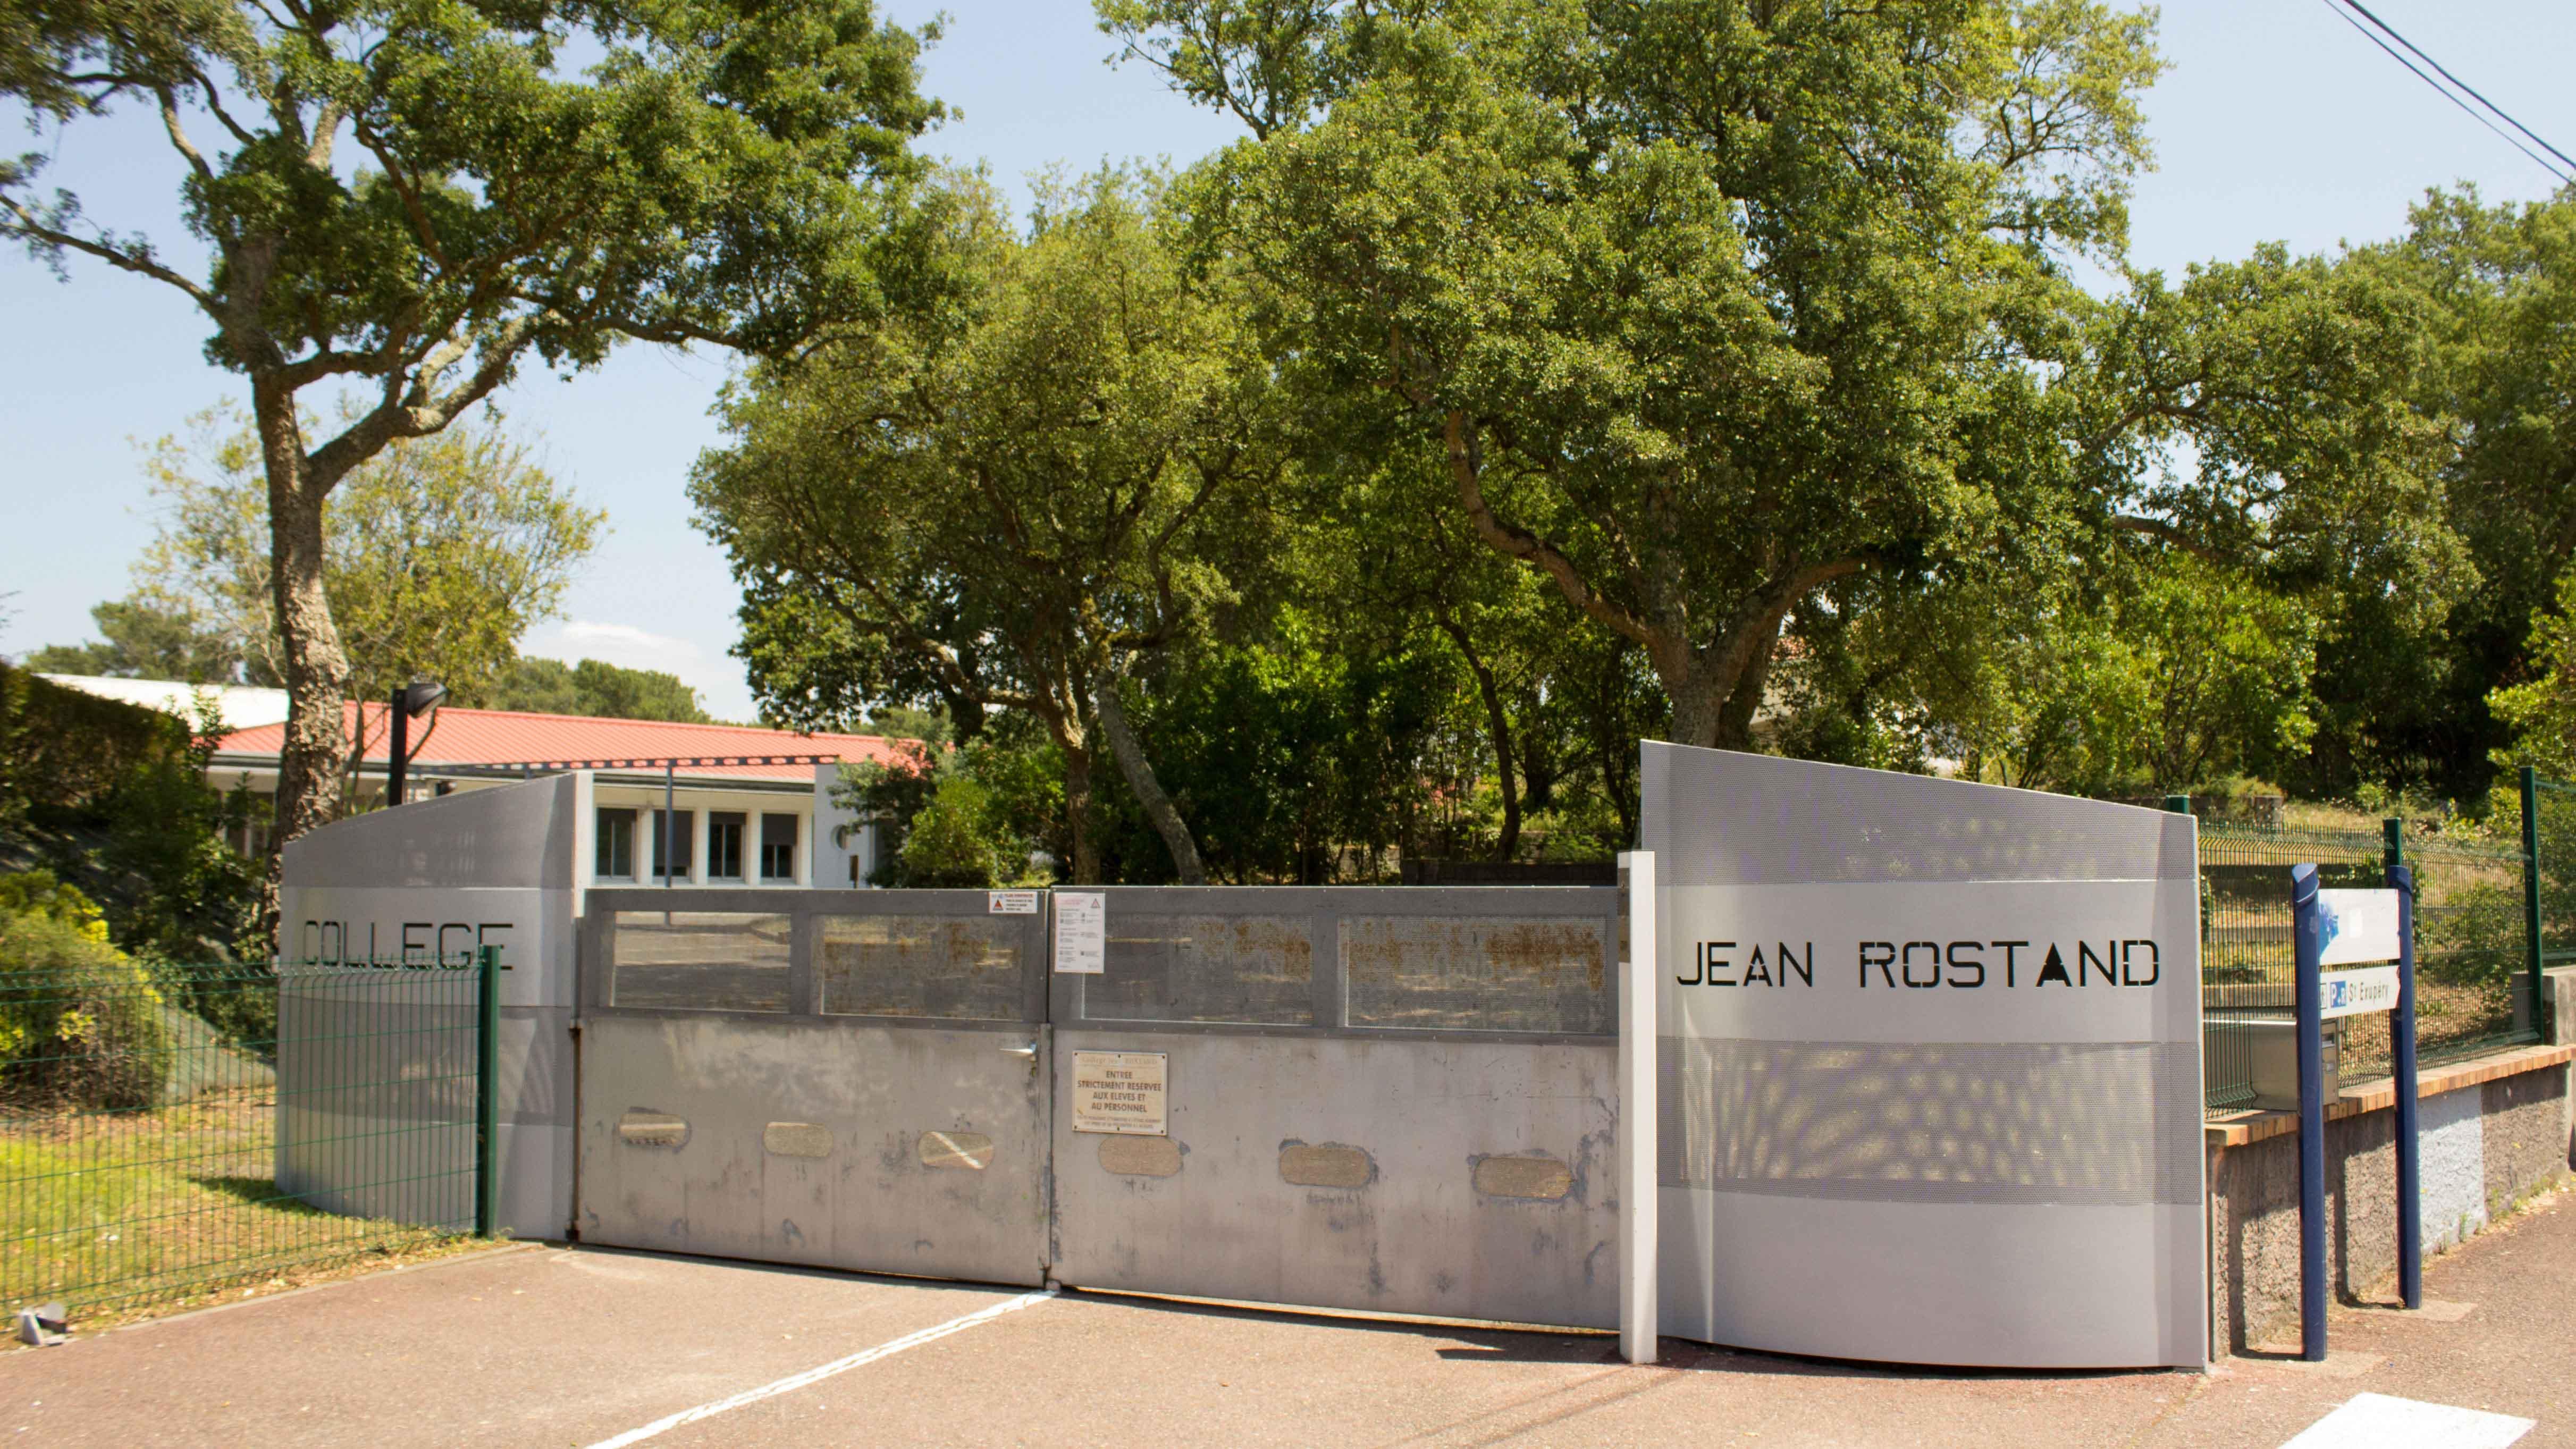 Collège Jean Rostand Capbreton - Entrée